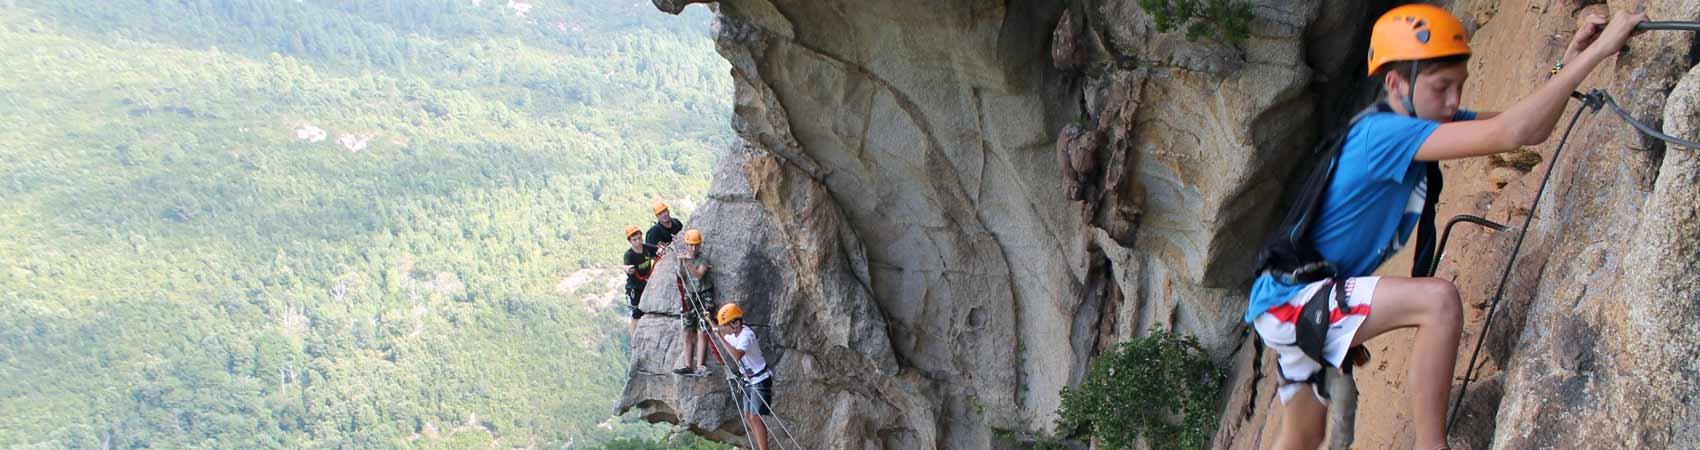 Camping luxe Corse activités